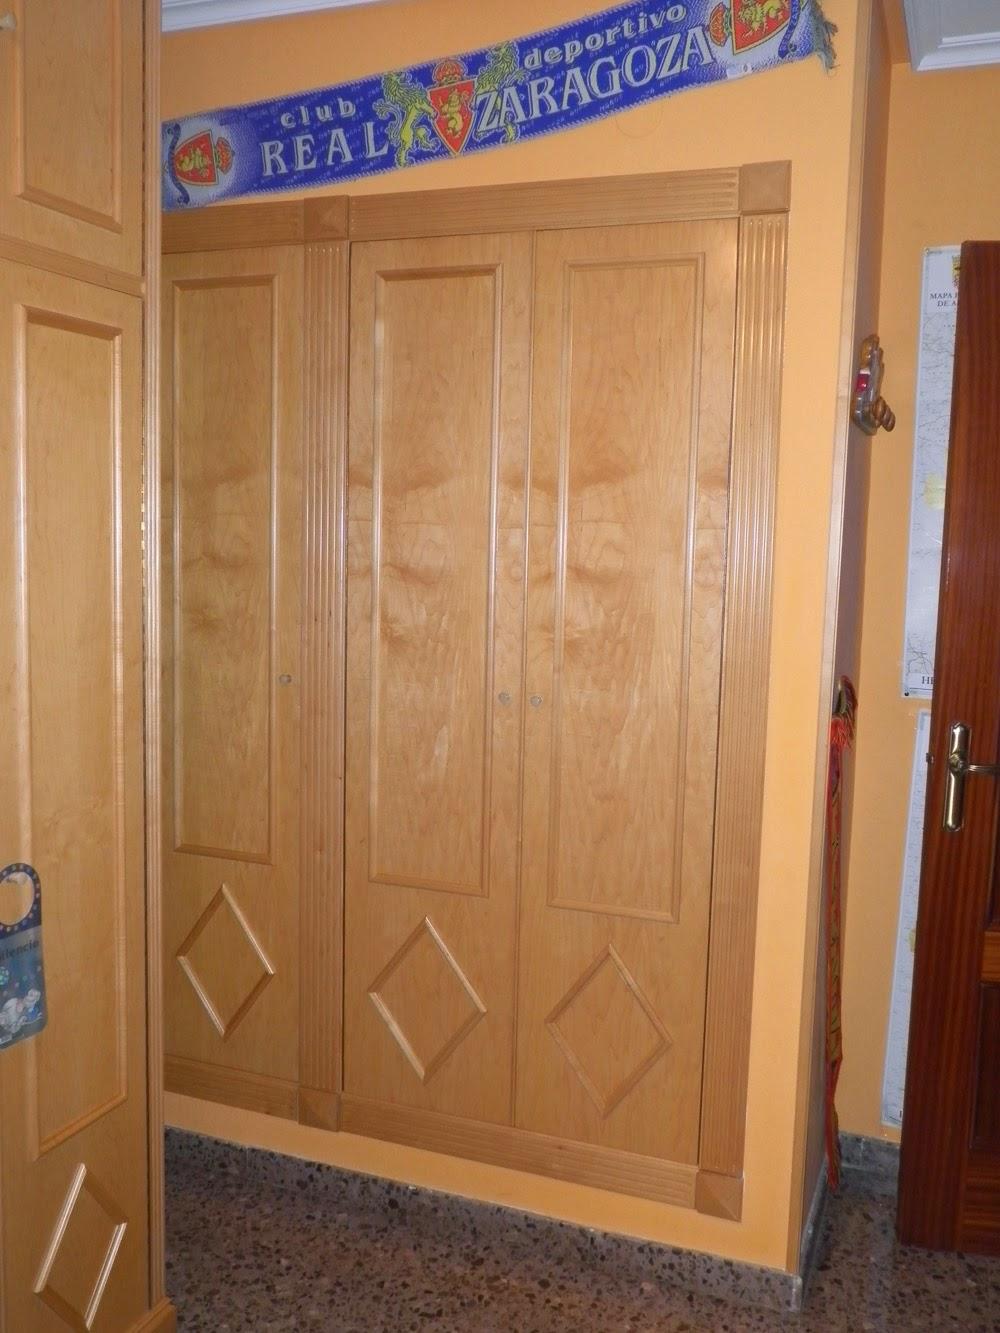 Dormitorio juvenil muebles cansado zaragoza carpintero ebanista artesano - Armarios a medida en zaragoza ...